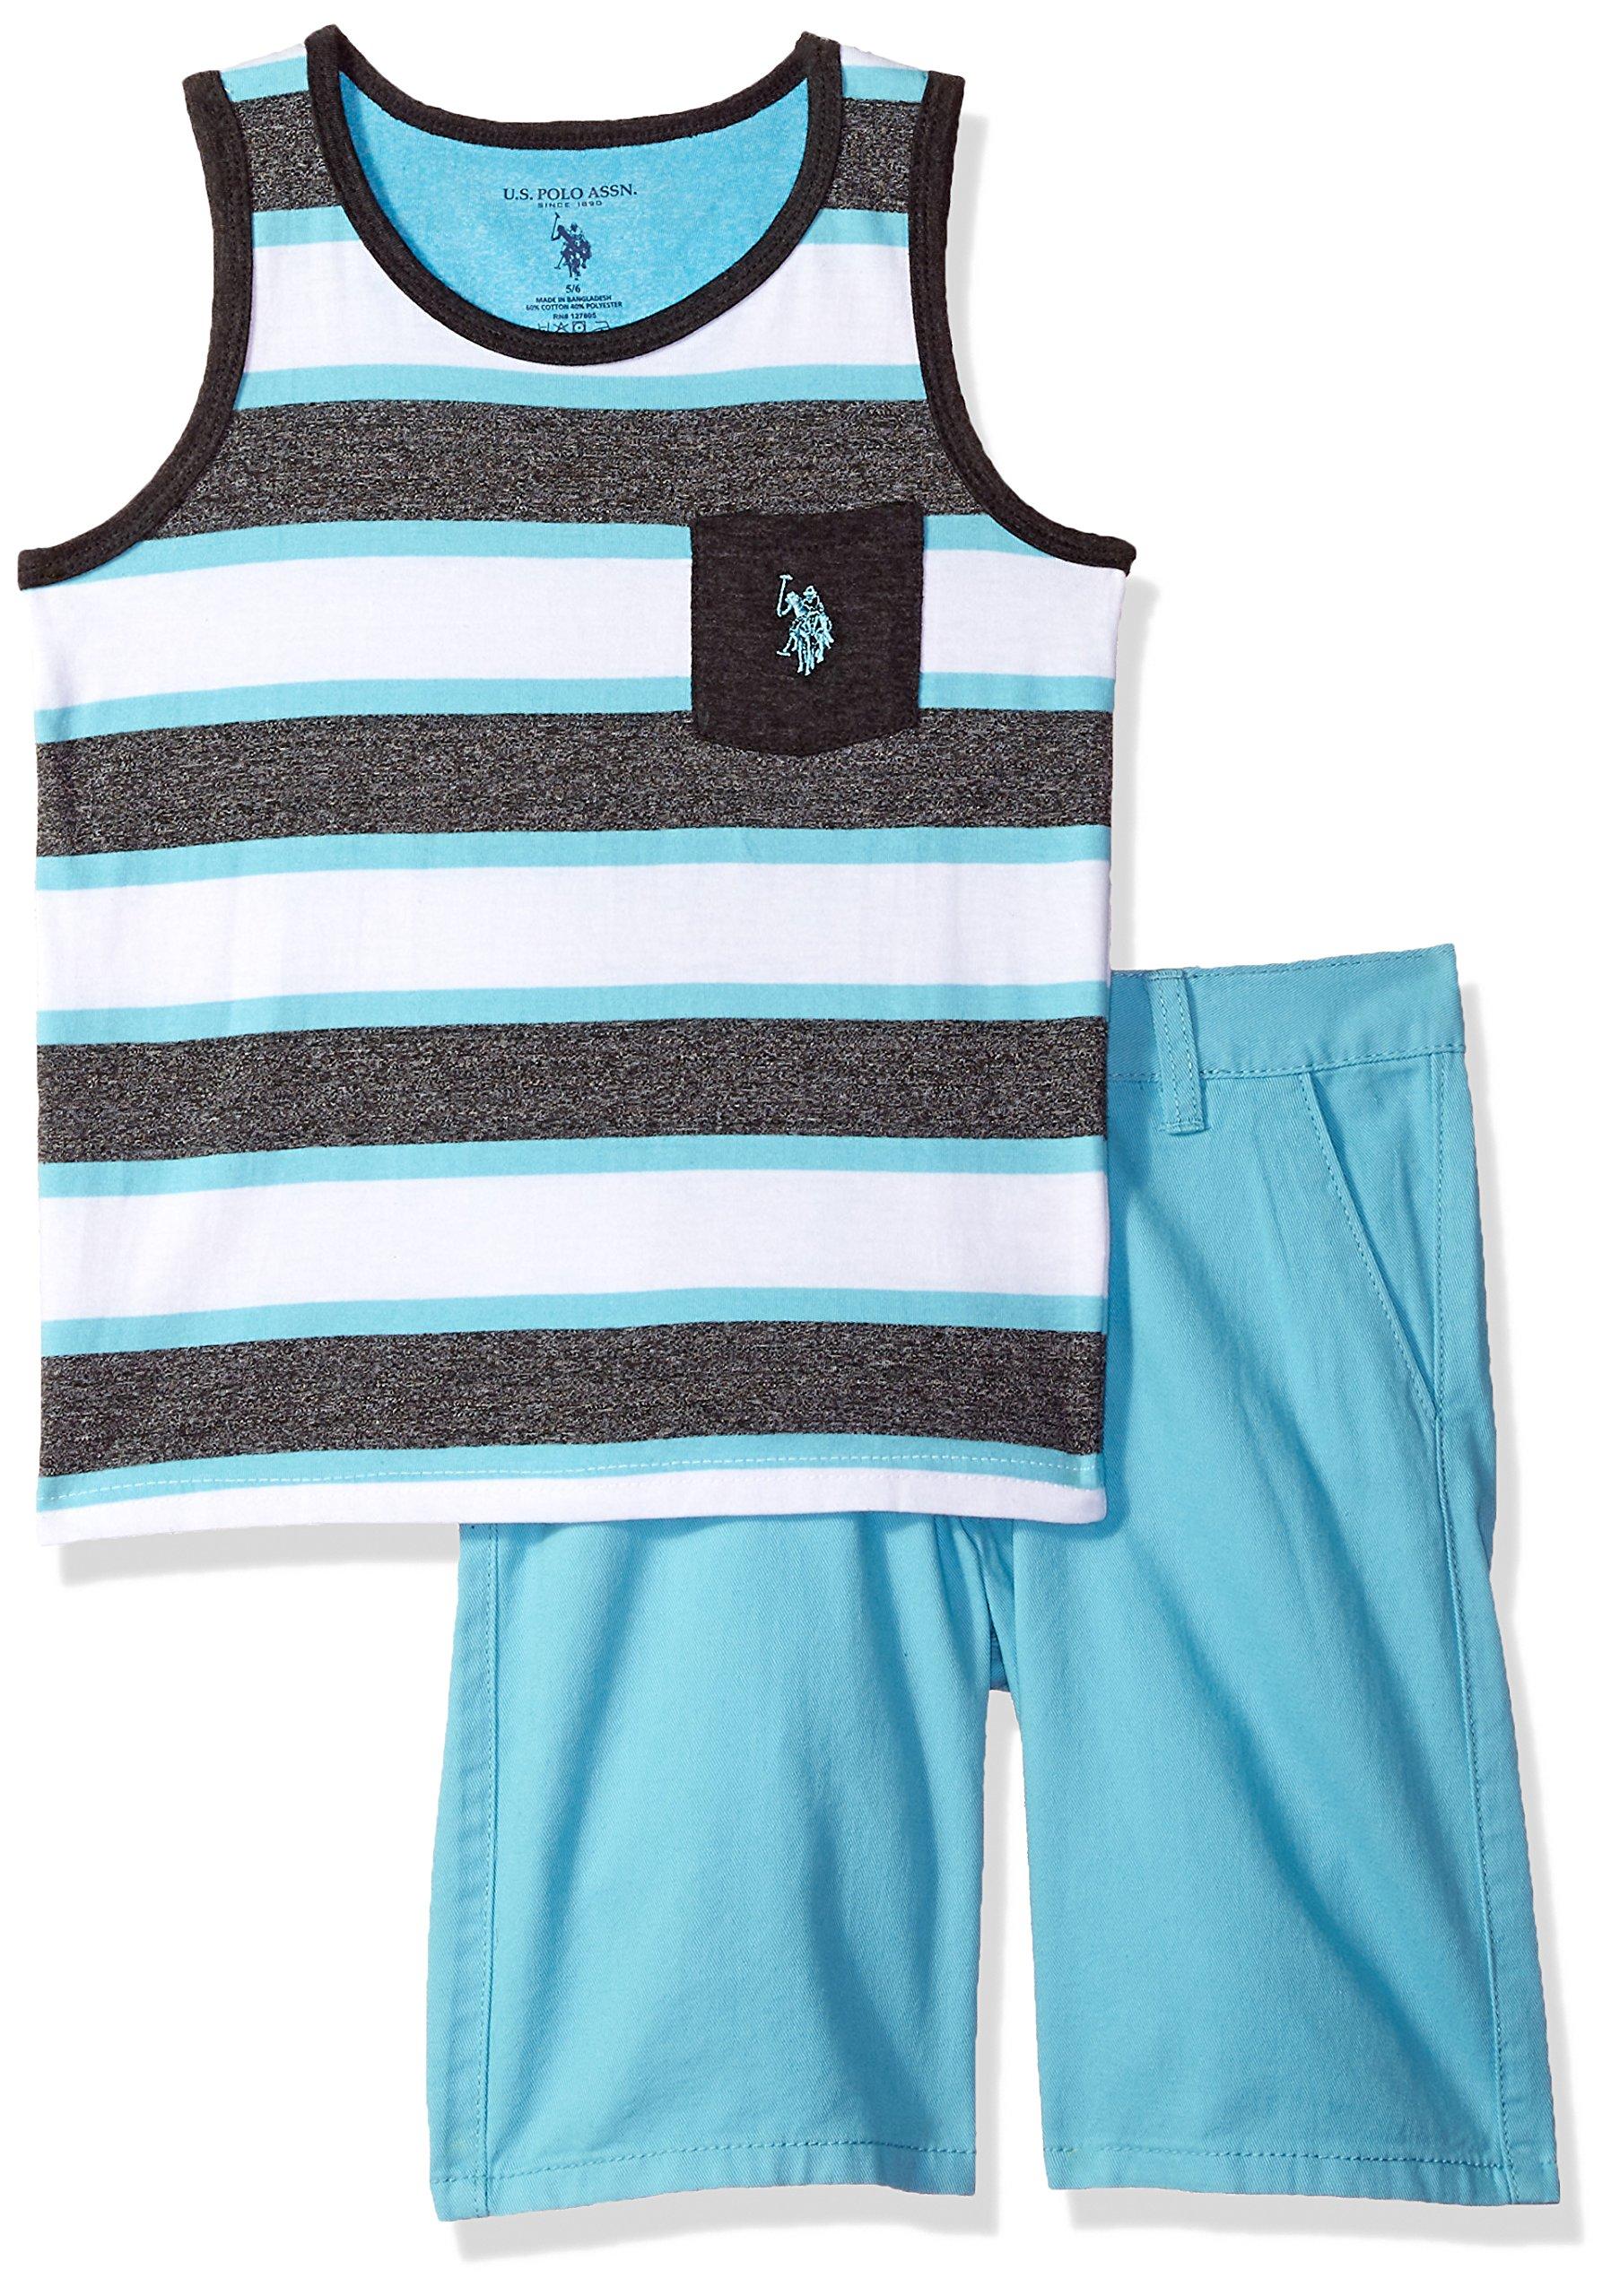 U.S. Polo Assn. Toddler Boys' Tank Short Set, Striped Tank Solid Short Aqua, 4T